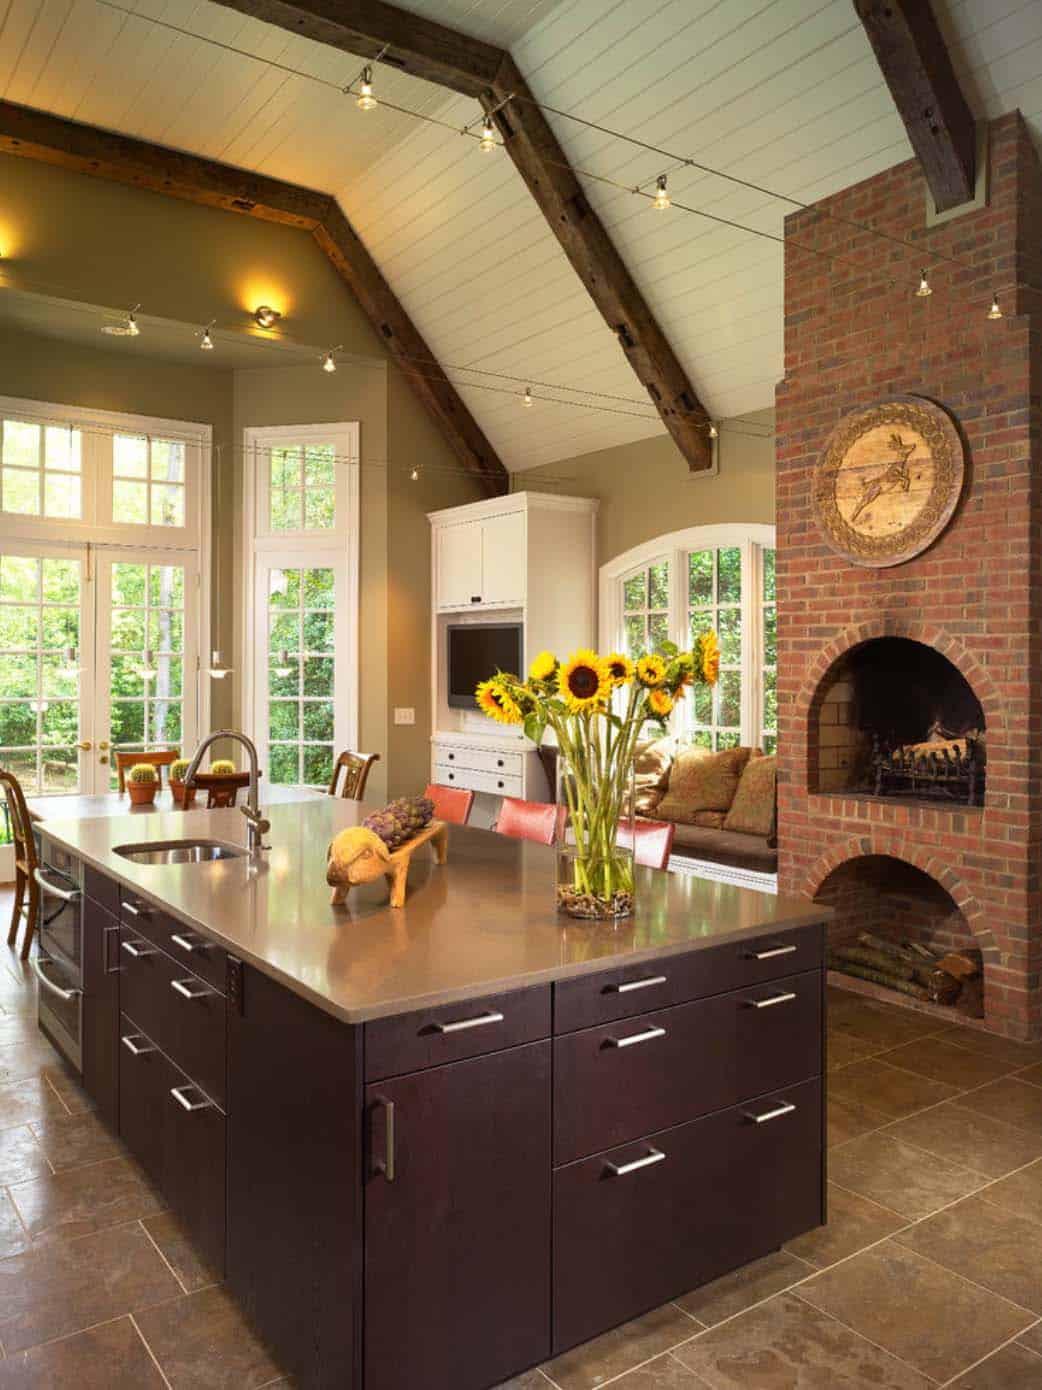 Kitchen Showcasing Cozy Fireplace-10-1 Kindesign